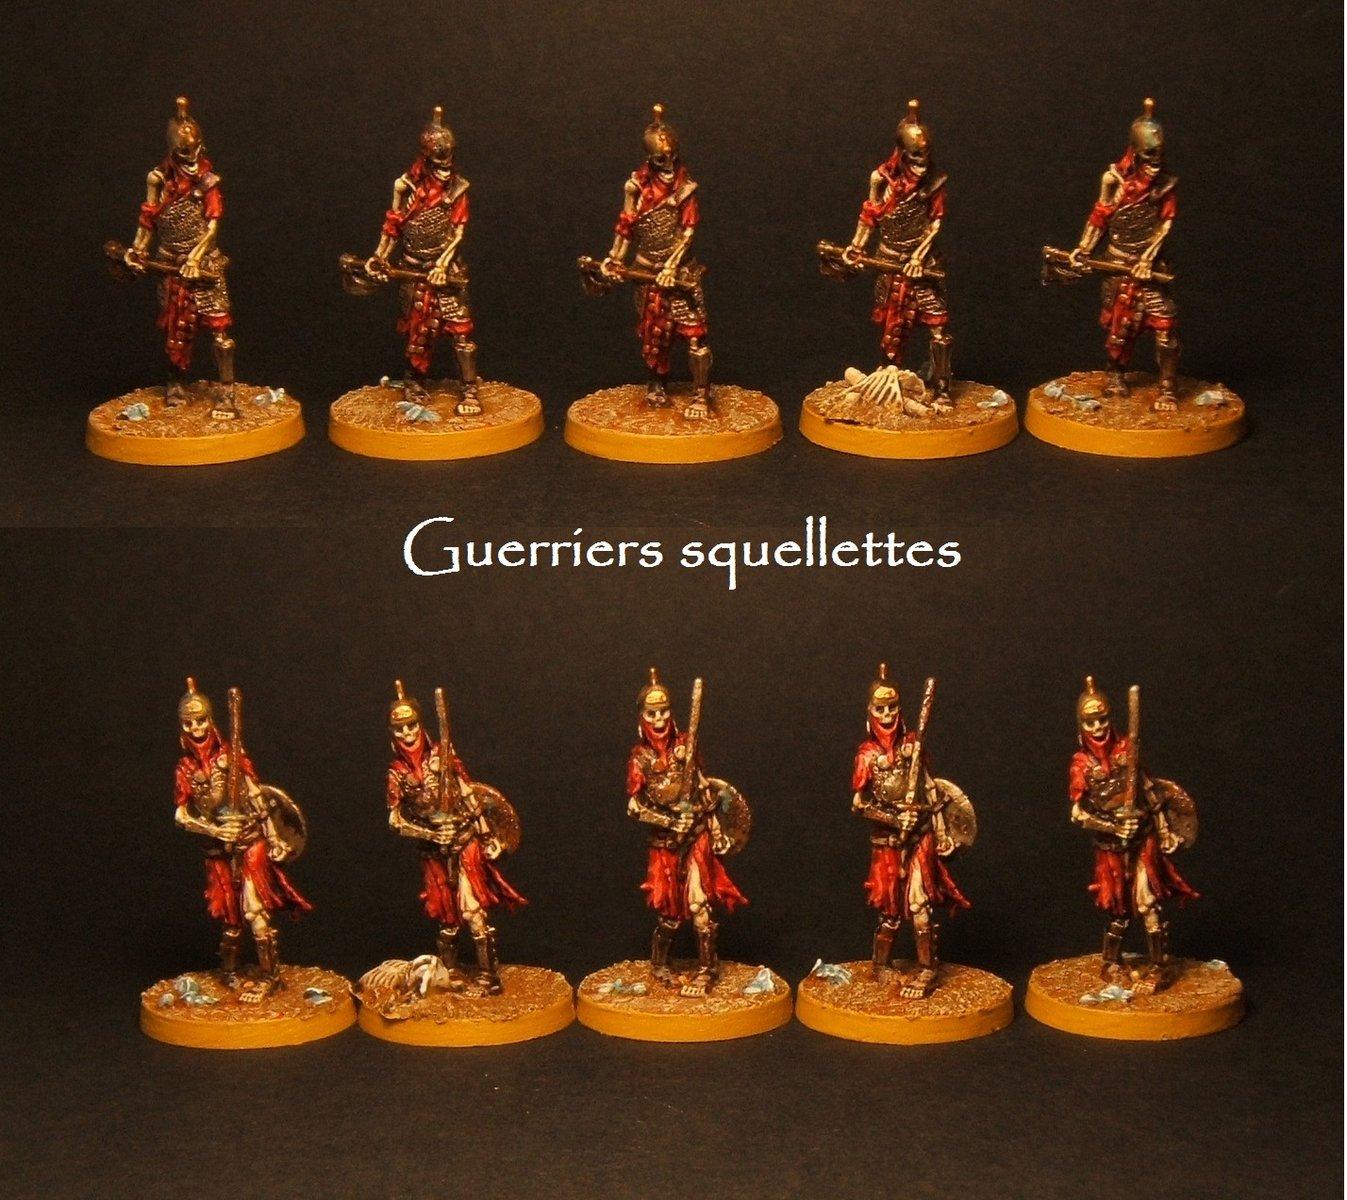 large.guerrierssquelettes.jpg.4ad1004c7c61c4fae223aa94341f0067.jpg